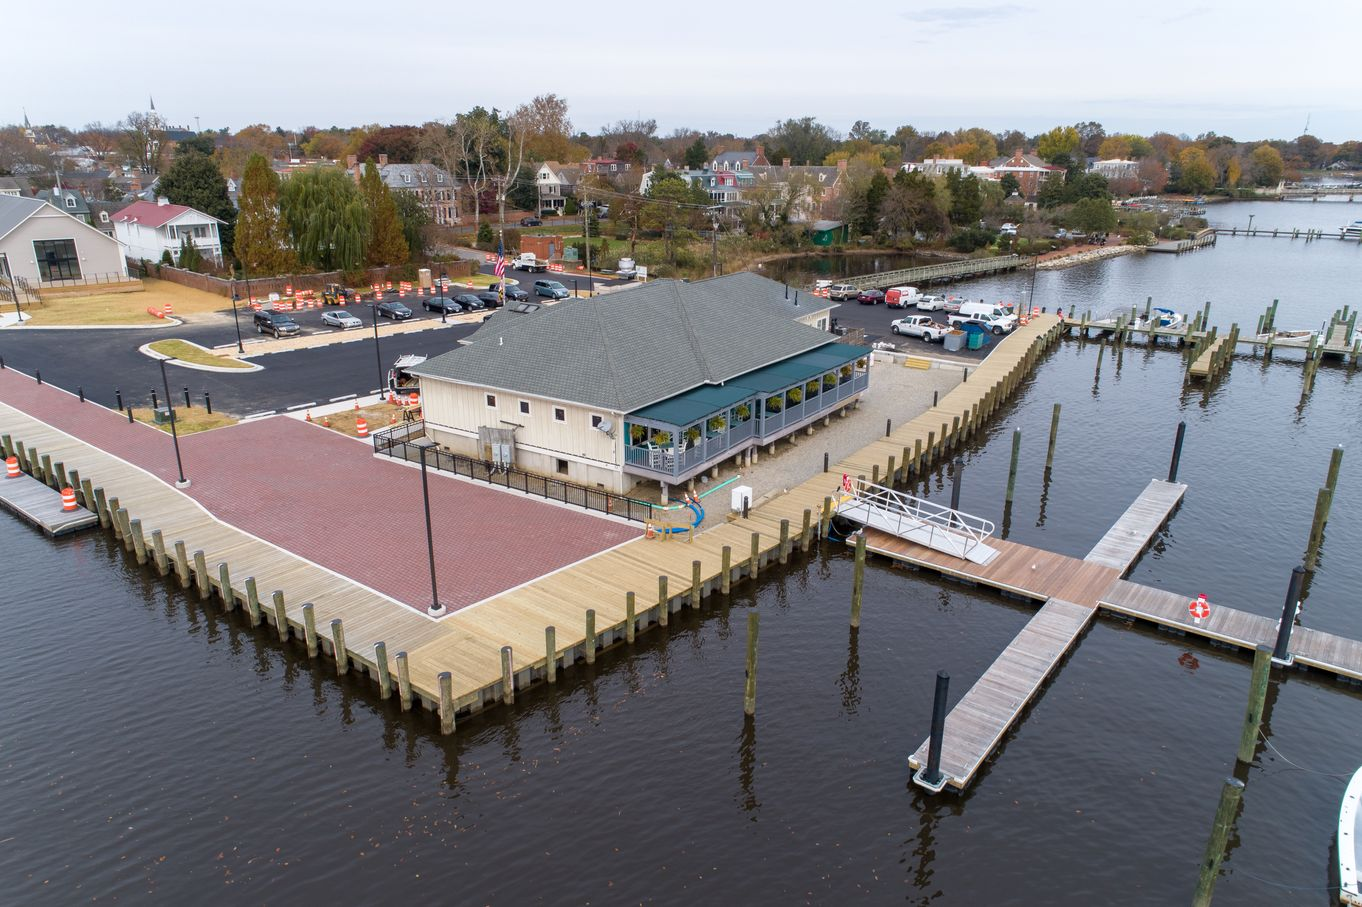 Chestertown Marina Drone Photo 10